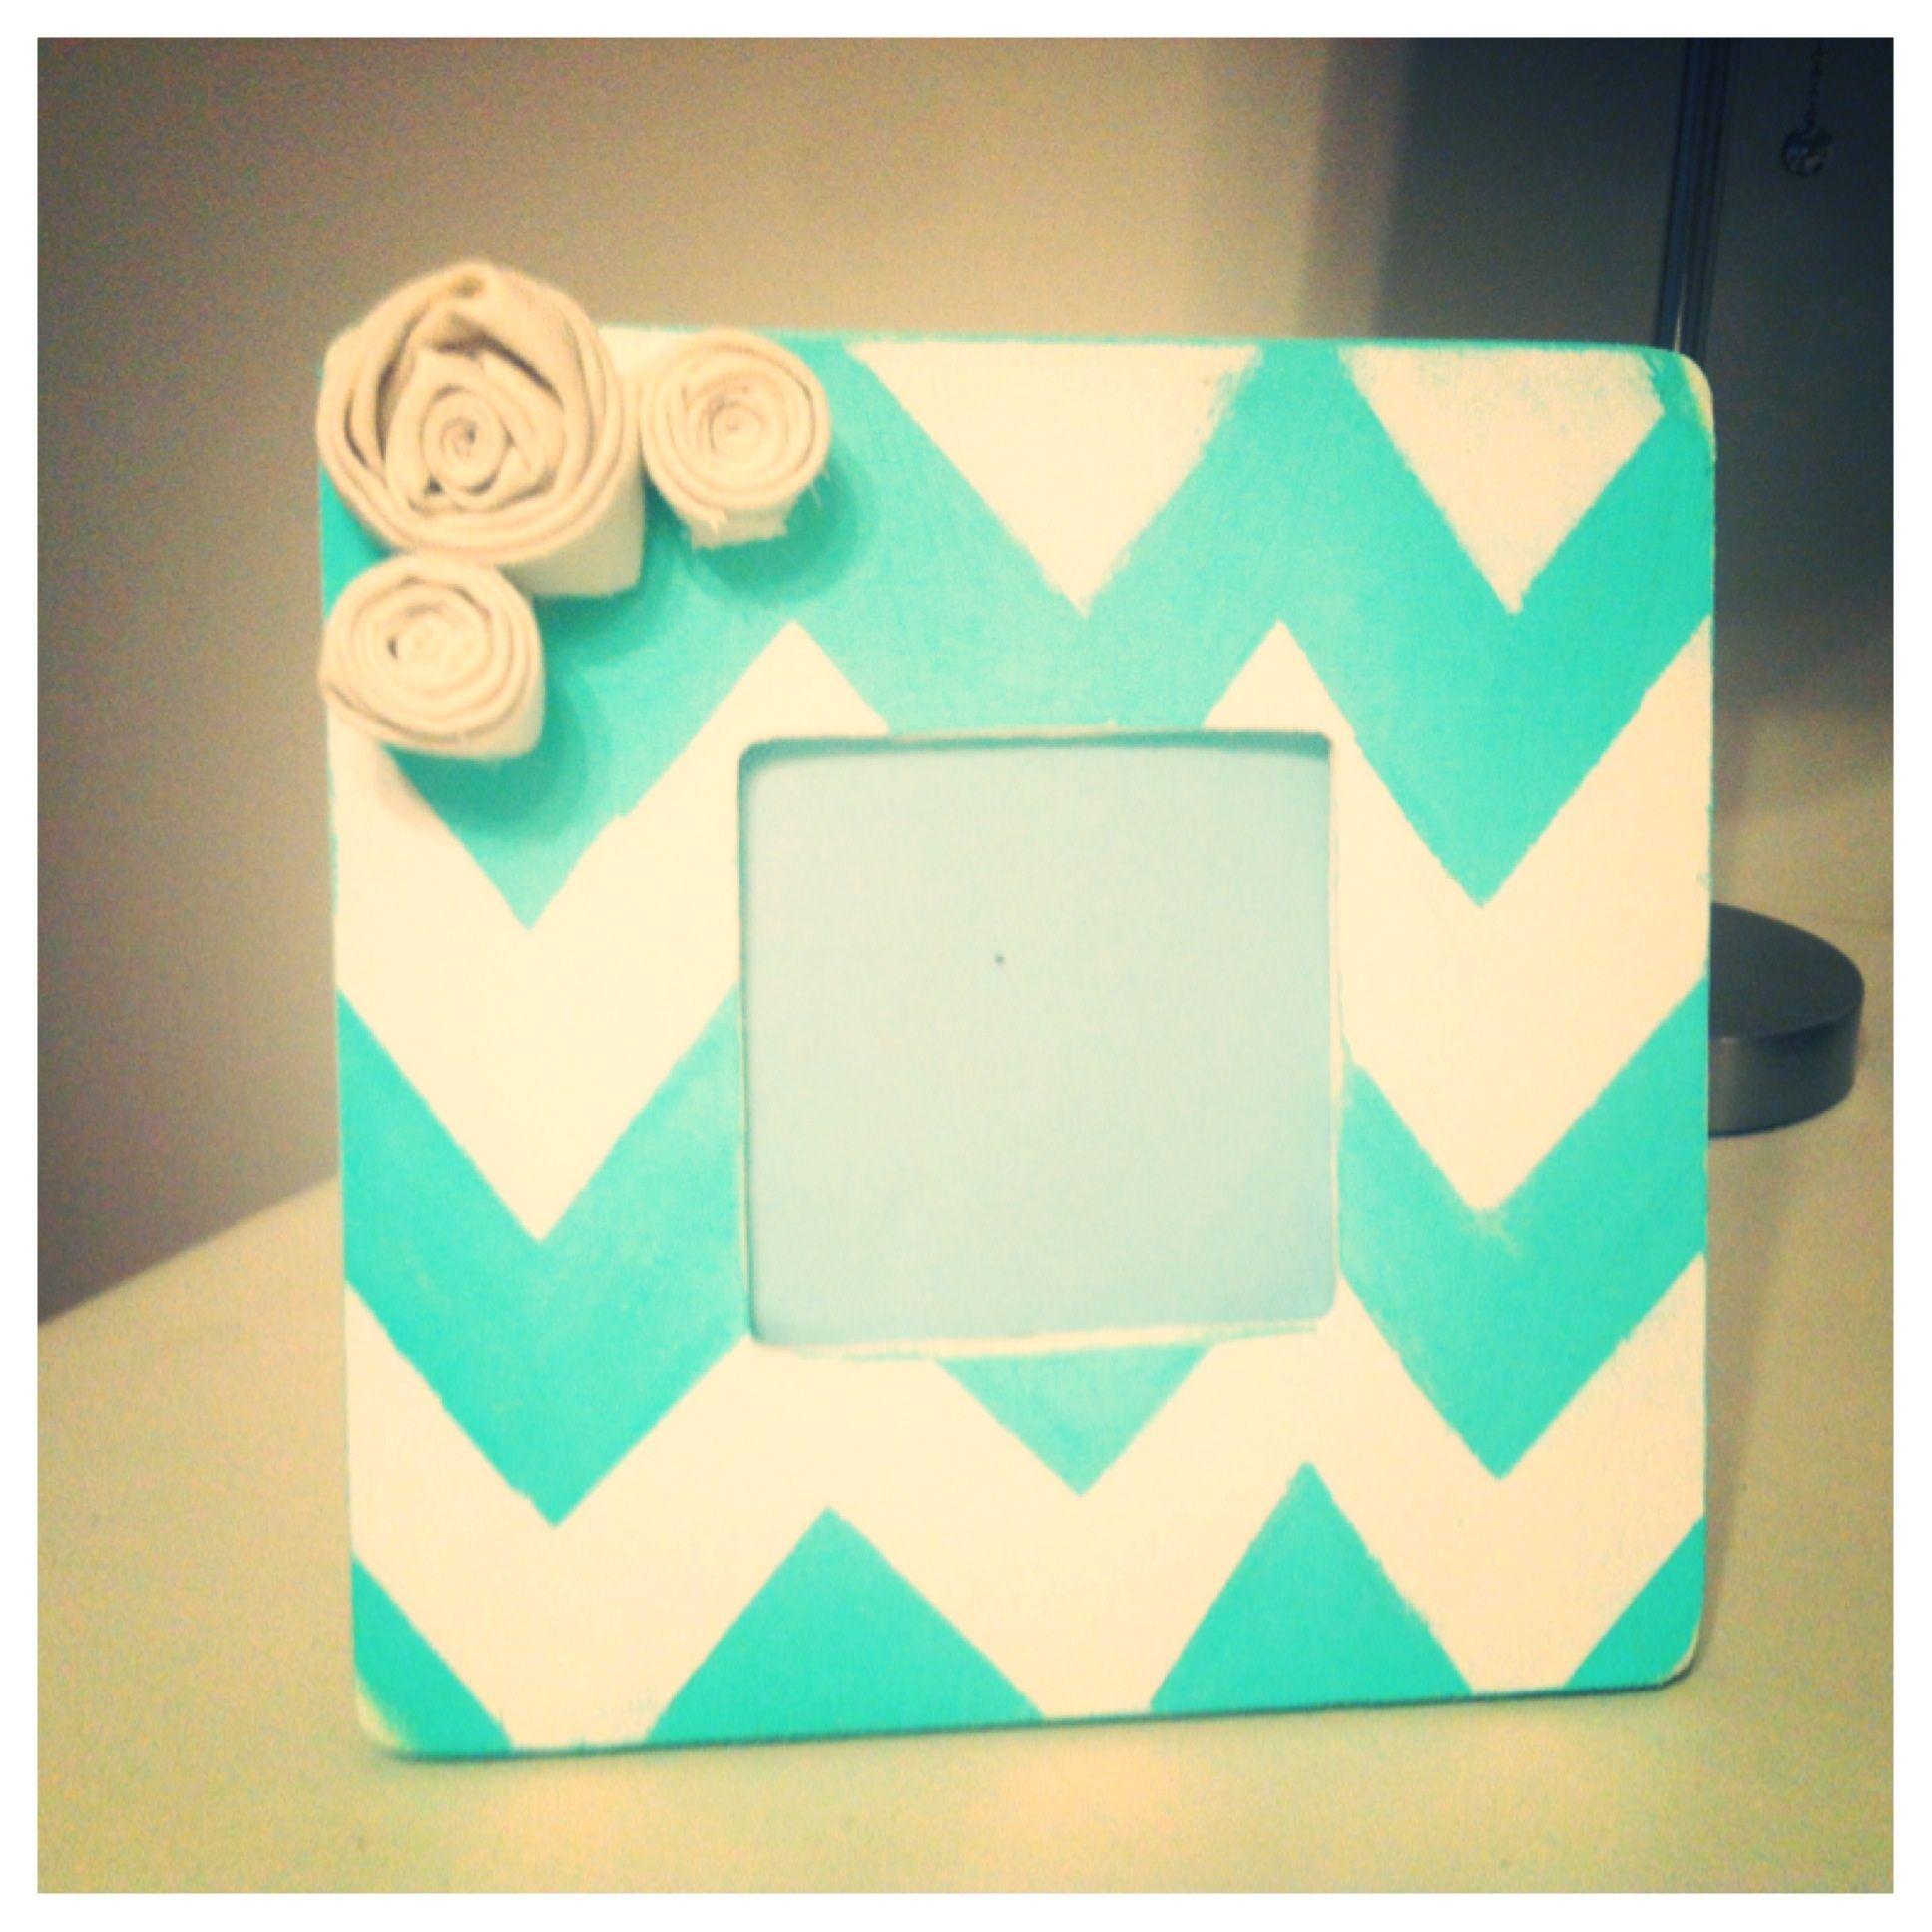 Tiffany blue chevron frame. | My Pinterest Projects | Pinterest ...